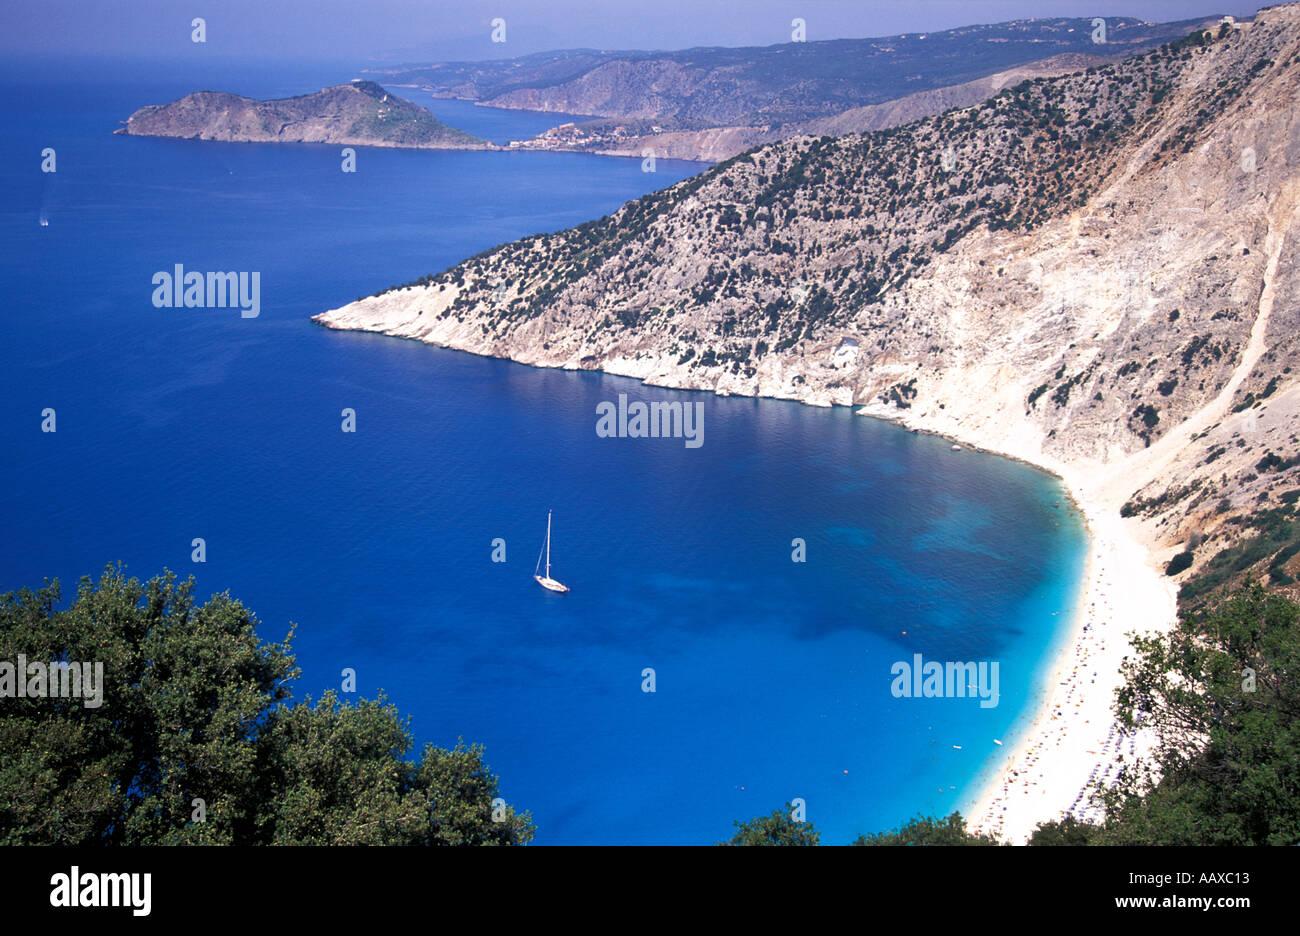 Yacht anchored in bay off Myrtos beach Kefalonia Ionian islands Greece Mediterranean Sea - Stock Image